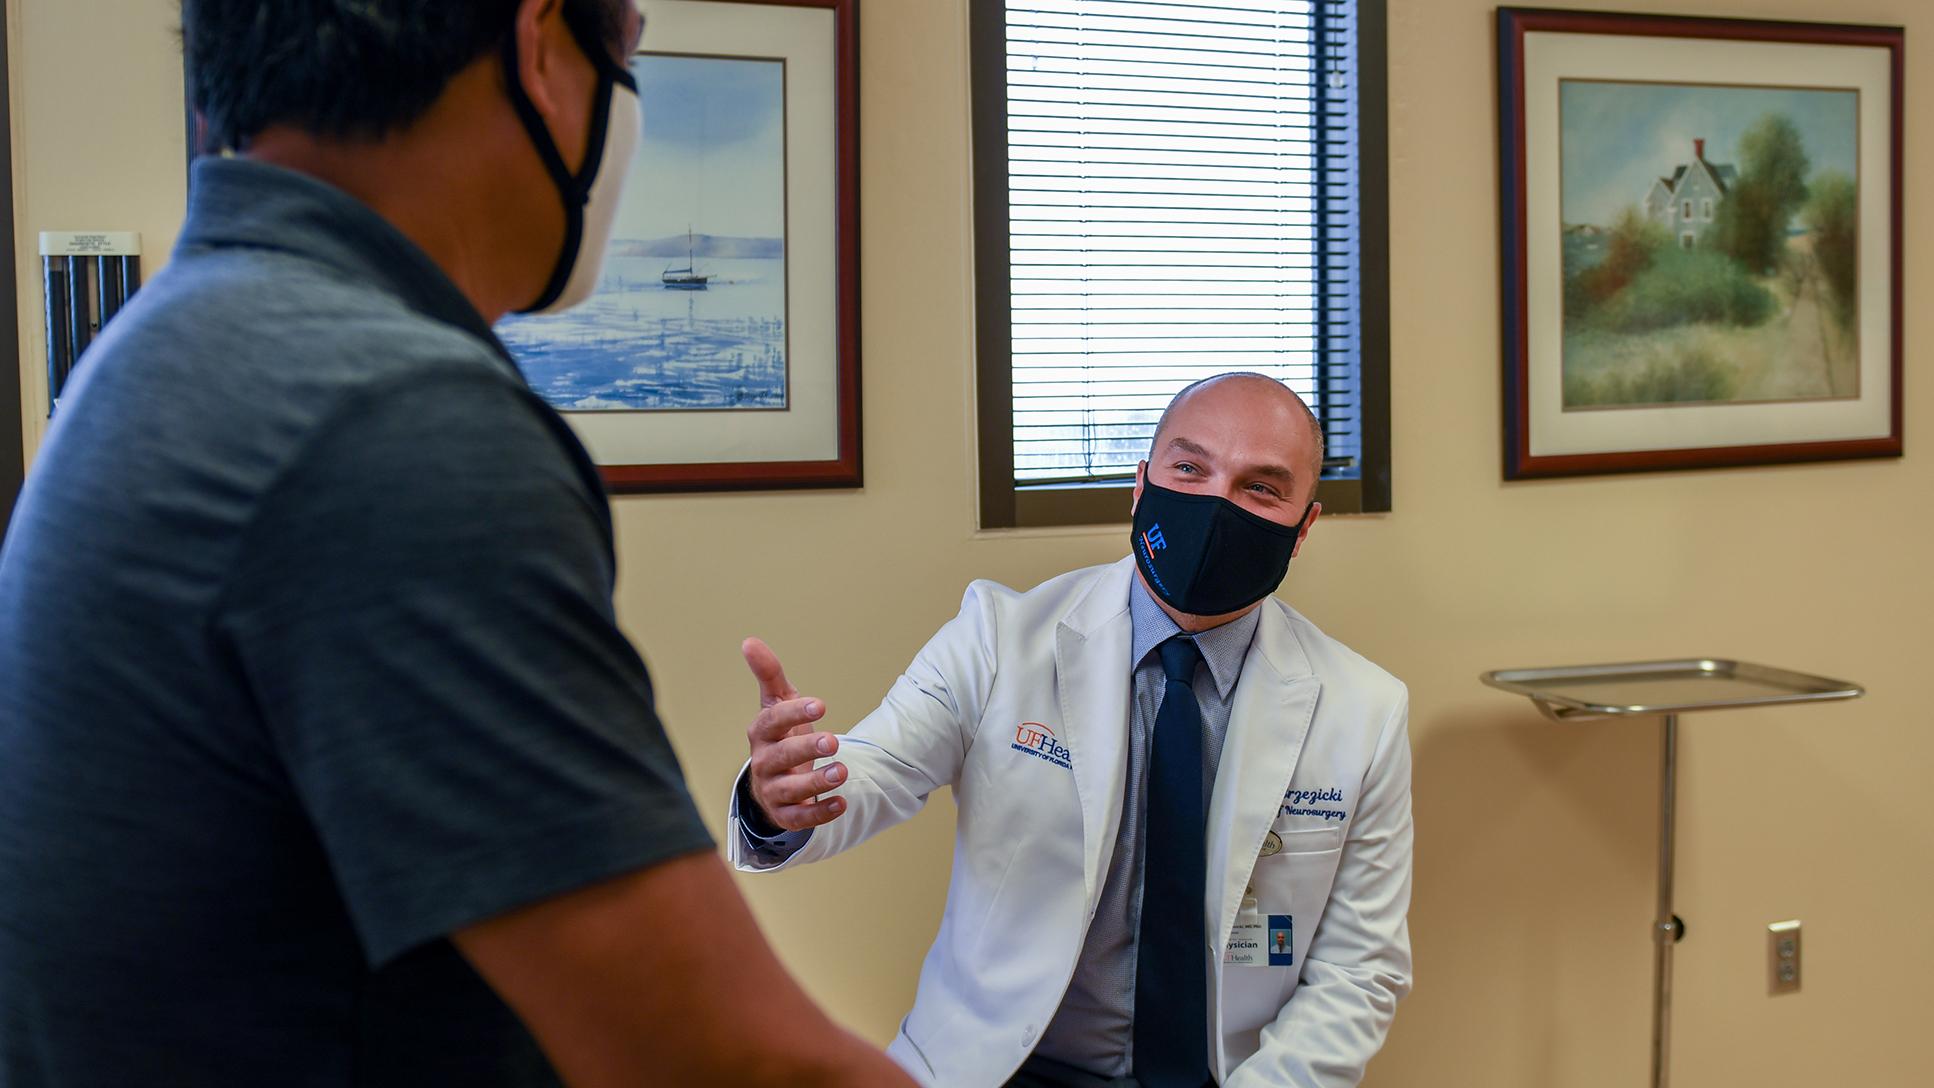 Dr. Brzezicki seeing a patient